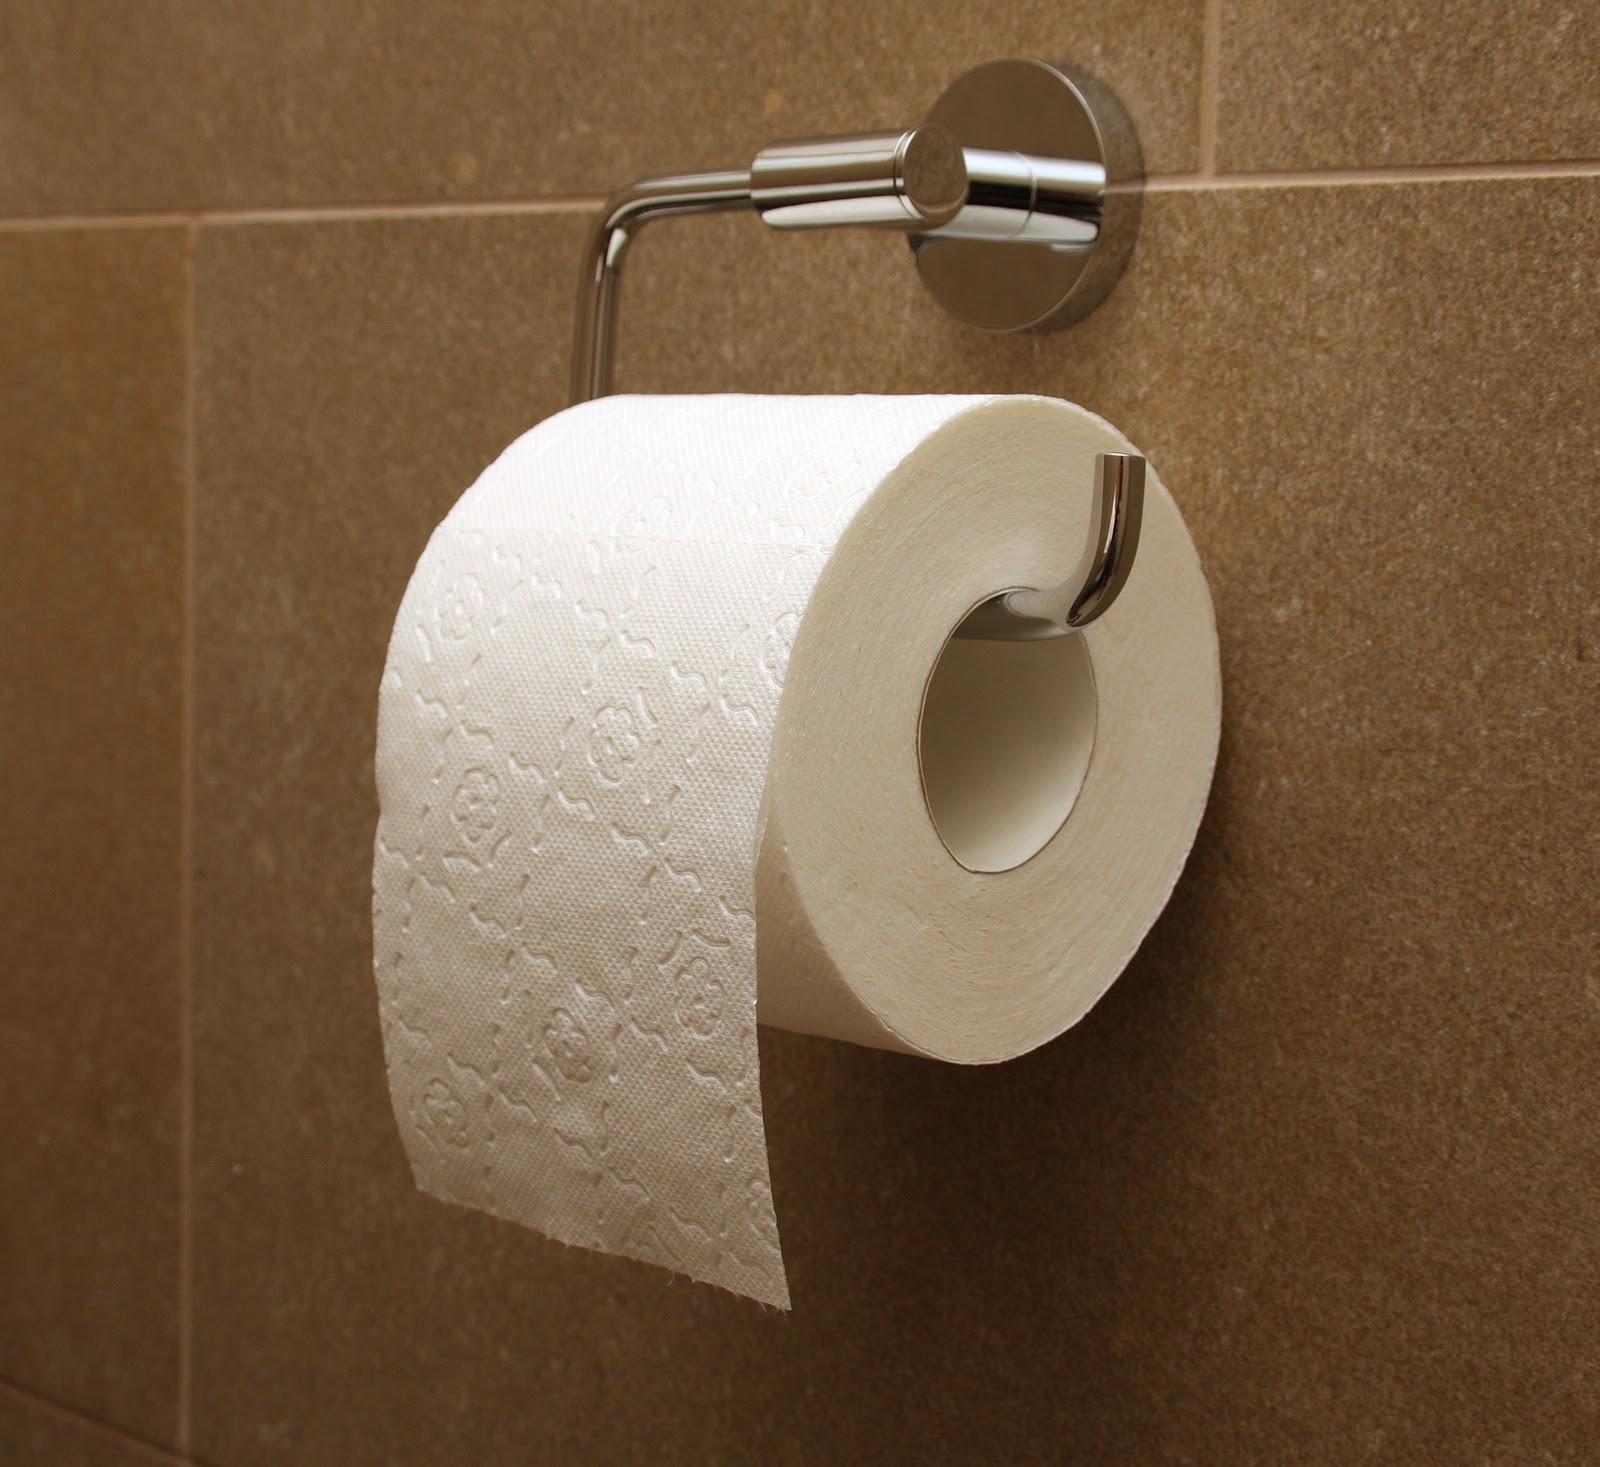 http://1.bp.blogspot.com/-81vs-YEpLJI/TnNj_GxBXMI/AAAAAAAAAPI/F3q9hMBW8TA/s1600/Toilet_paper_orientation_over.jpg